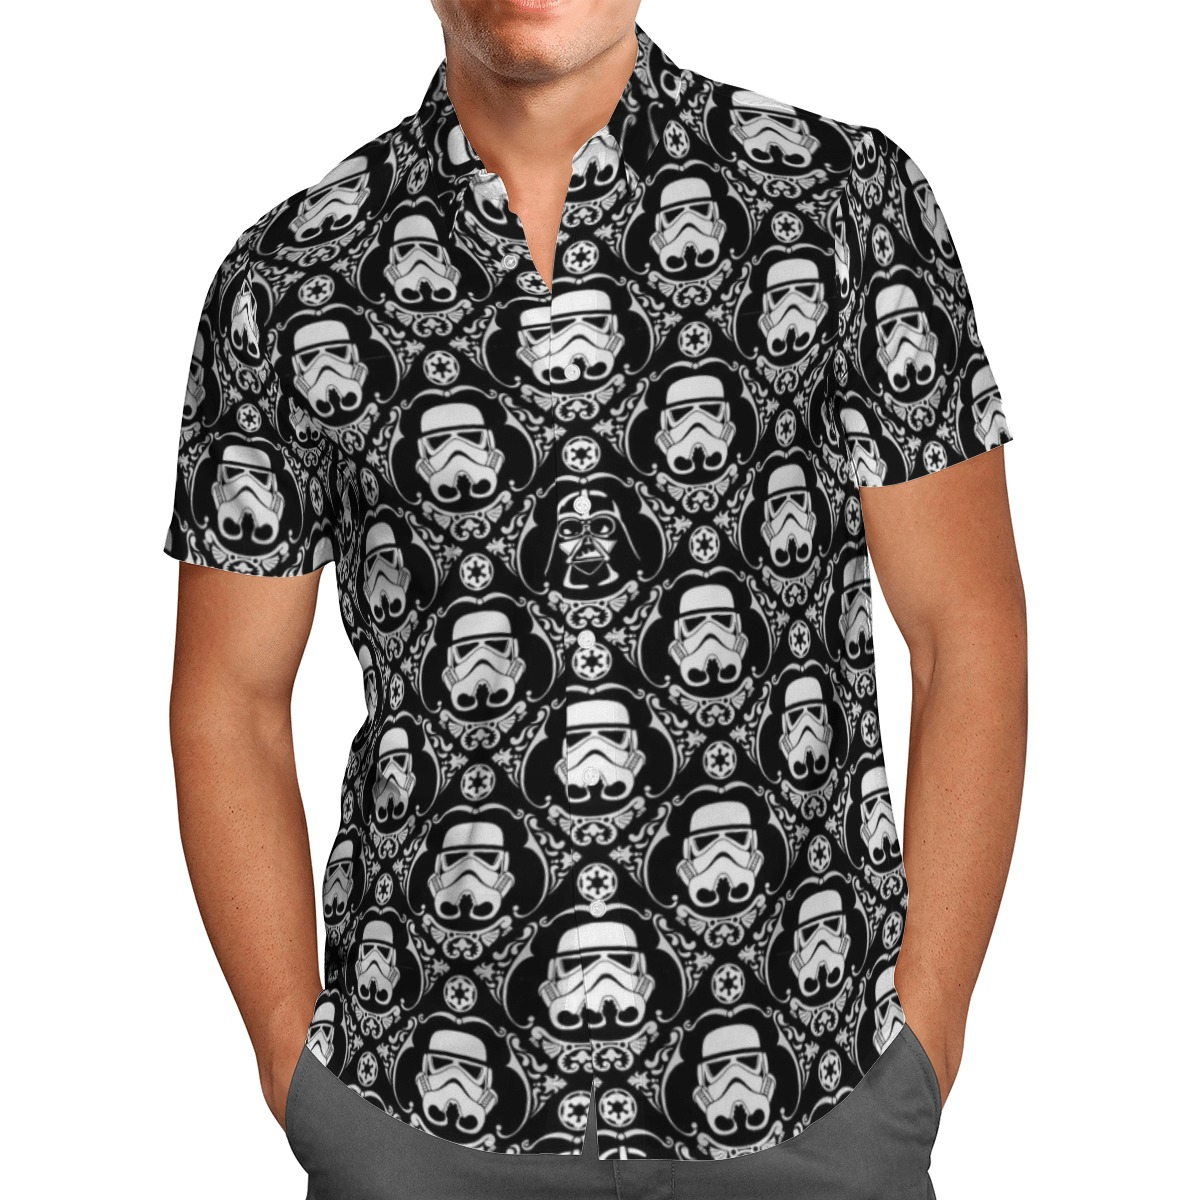 Star Wars Stormtrooper Portrait Hawaiian shirt